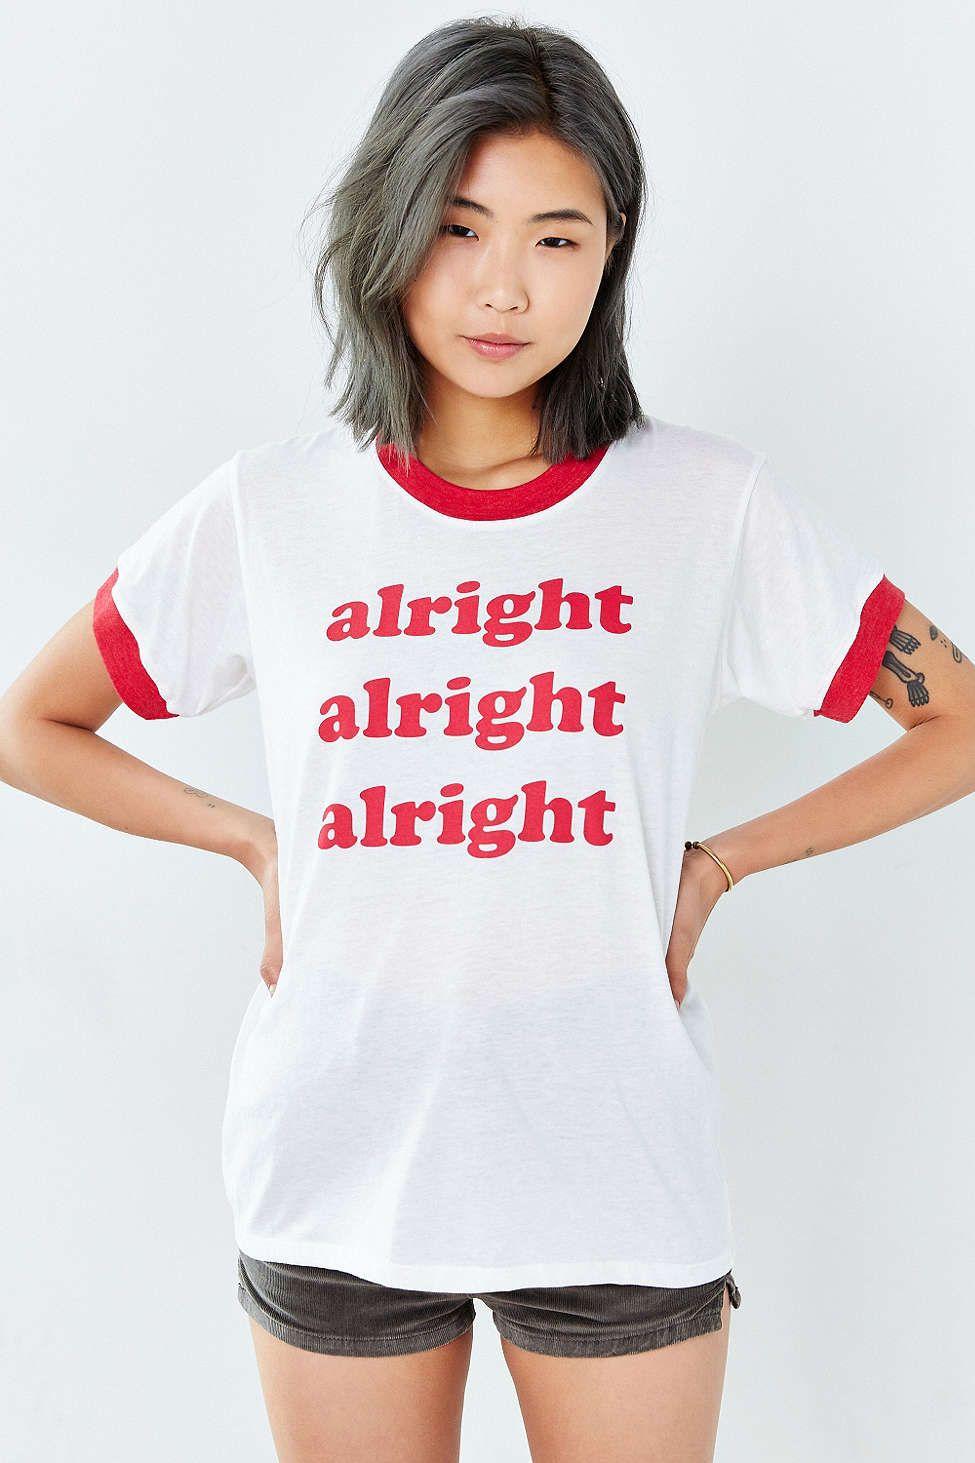 37+ Urban outfitters california t shirt ideas